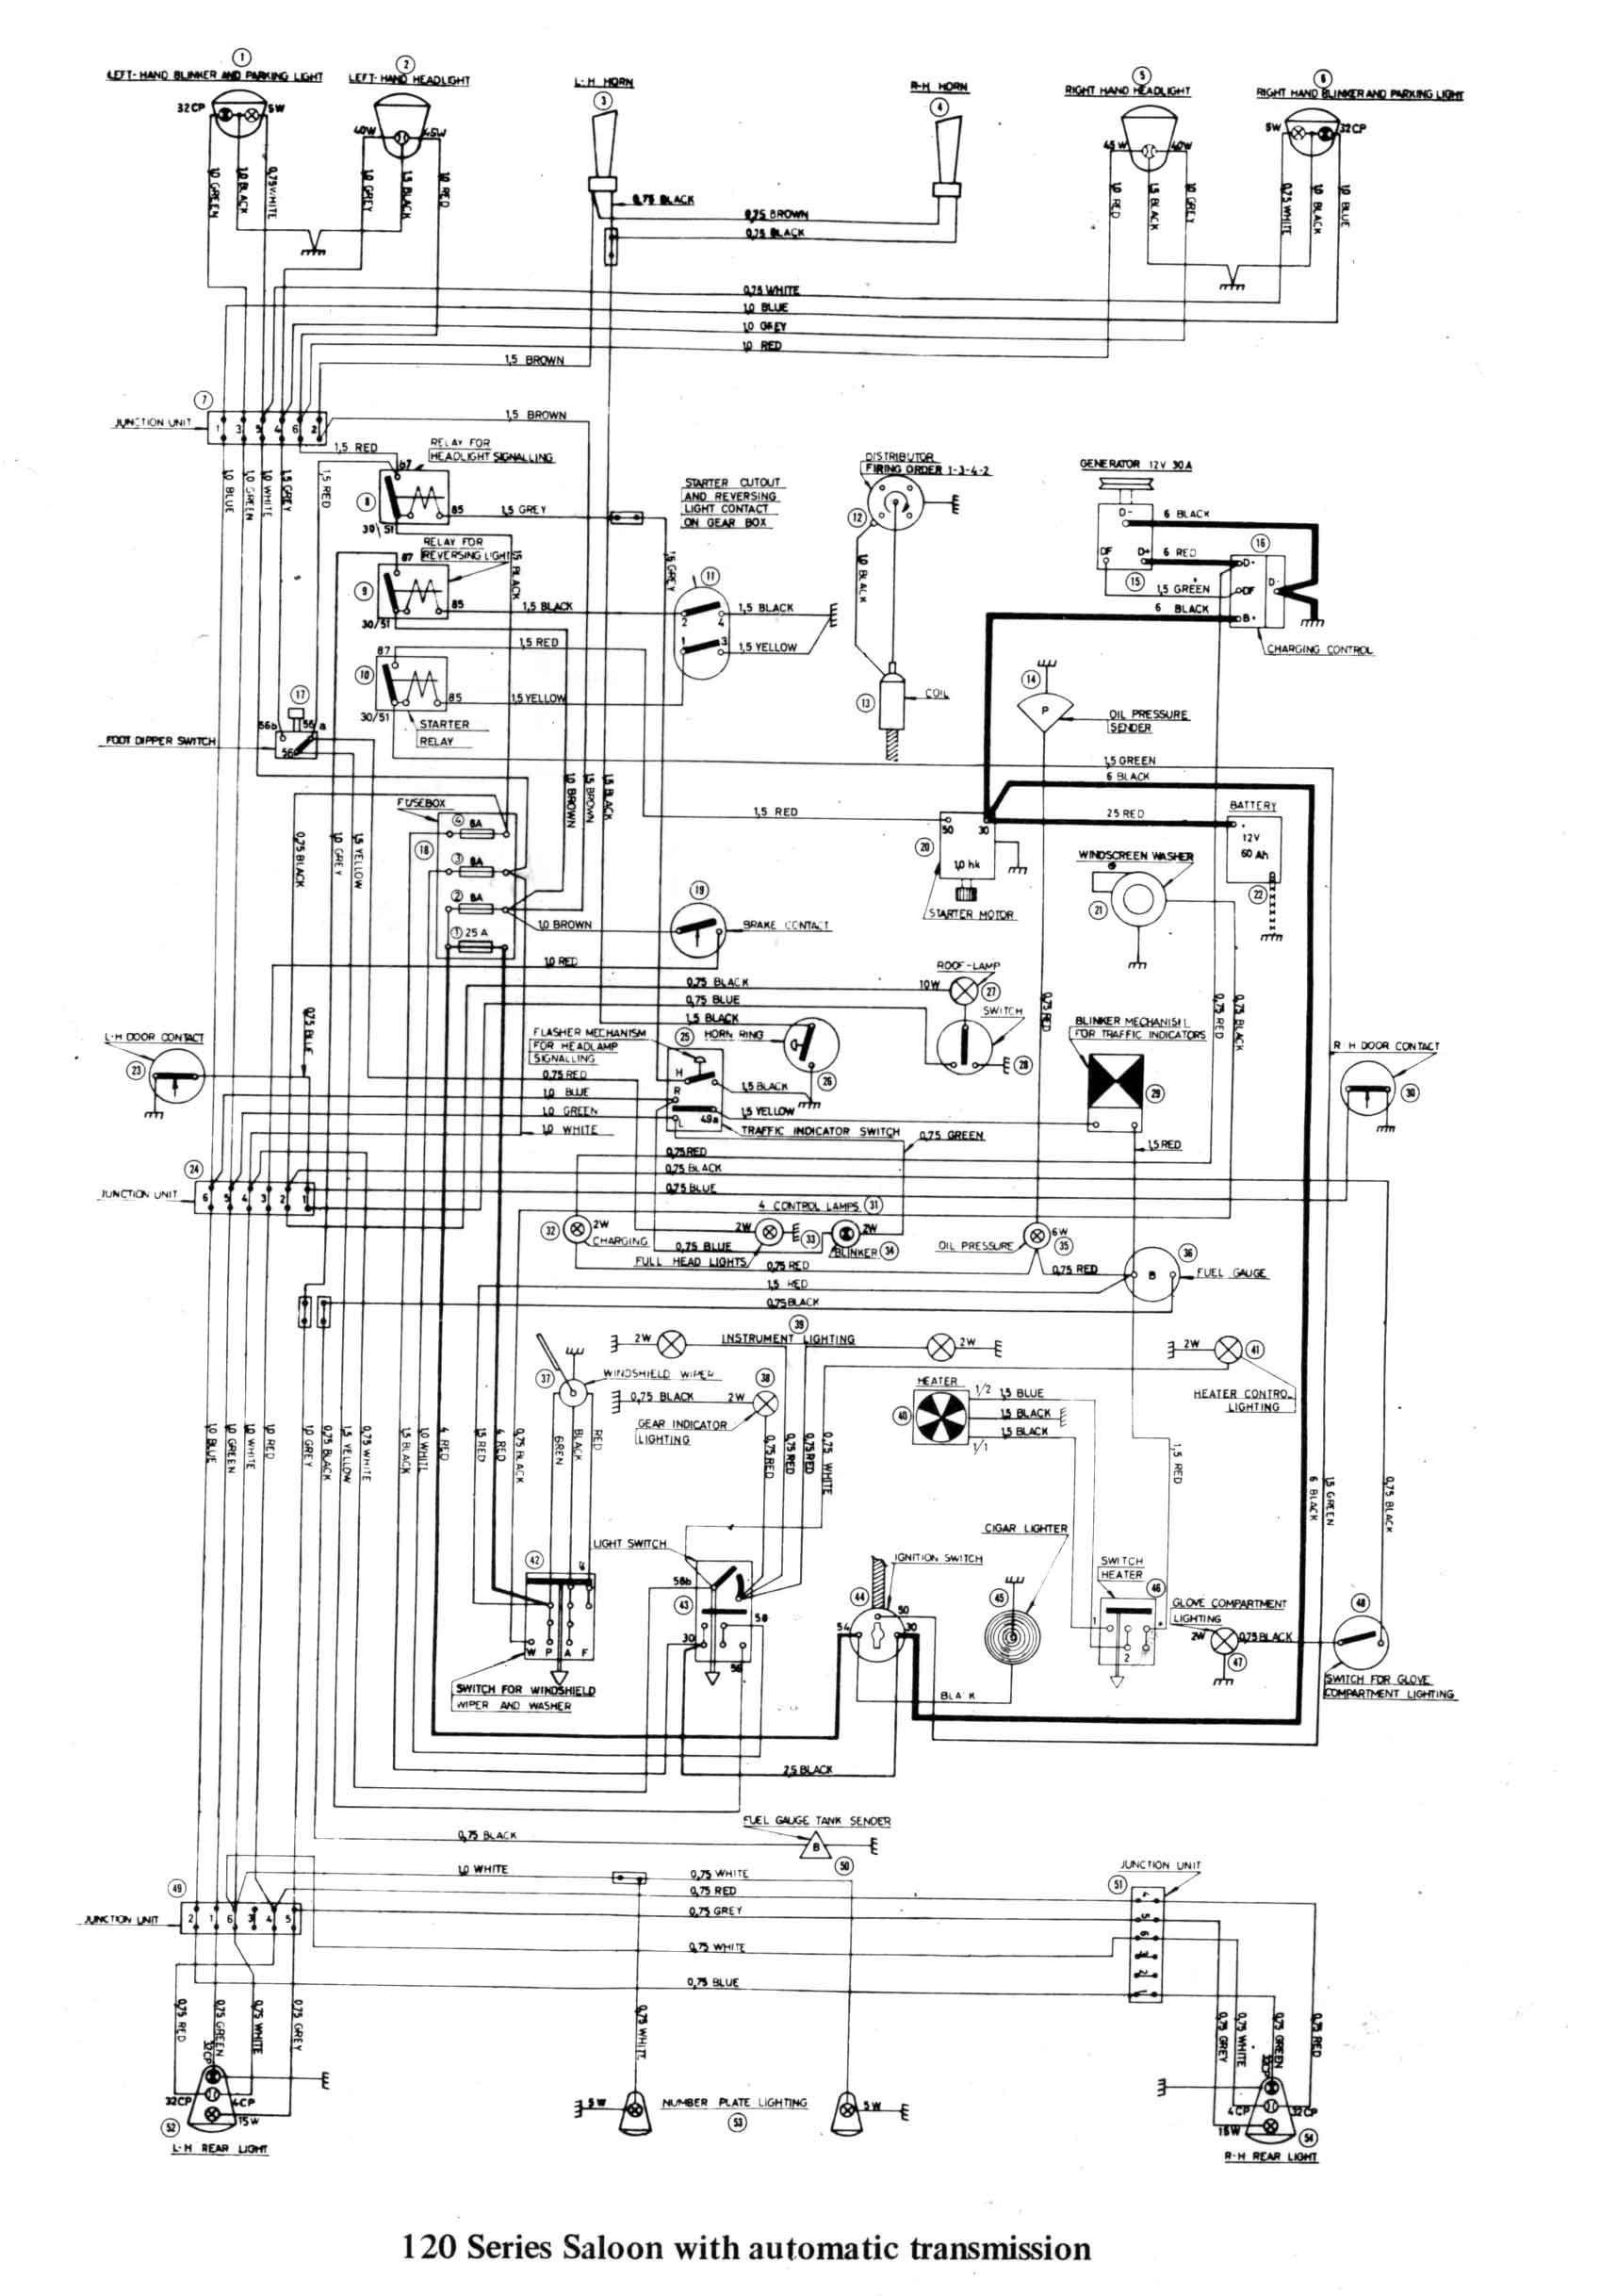 Diagram Of Car Gears Gear Shift Diagram Of Diagram Of Car Gears Car Engine Belt Diagram 50 Unique Stock 2007 Bmw X3 Serpentine Belt